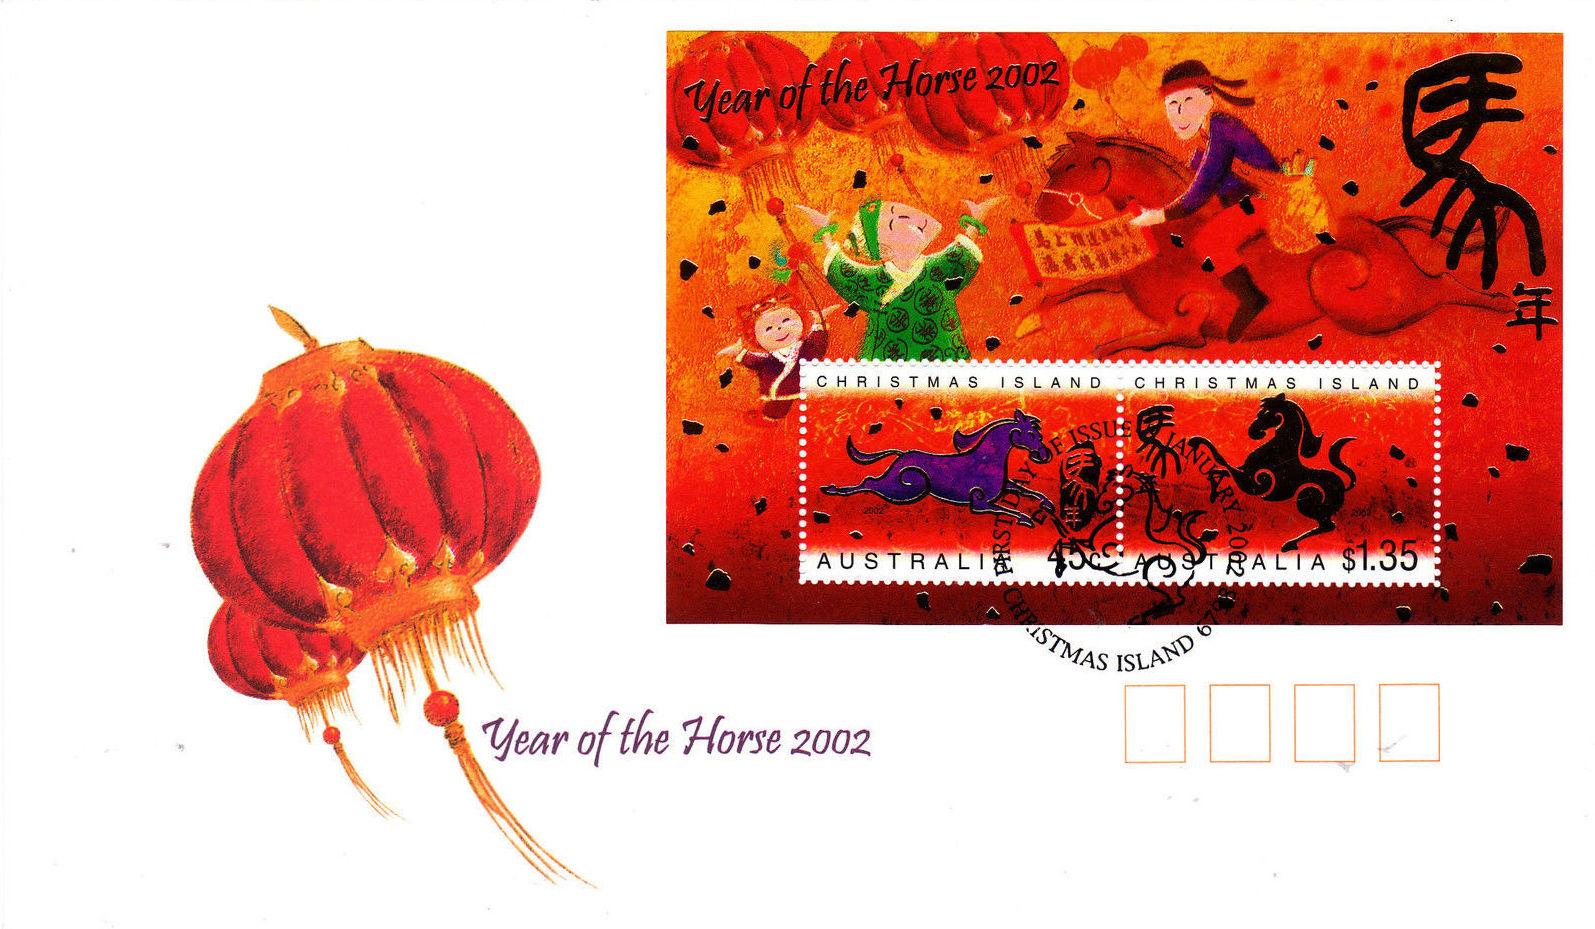 Christmas Island 2002 Year of the Horse s.jpg